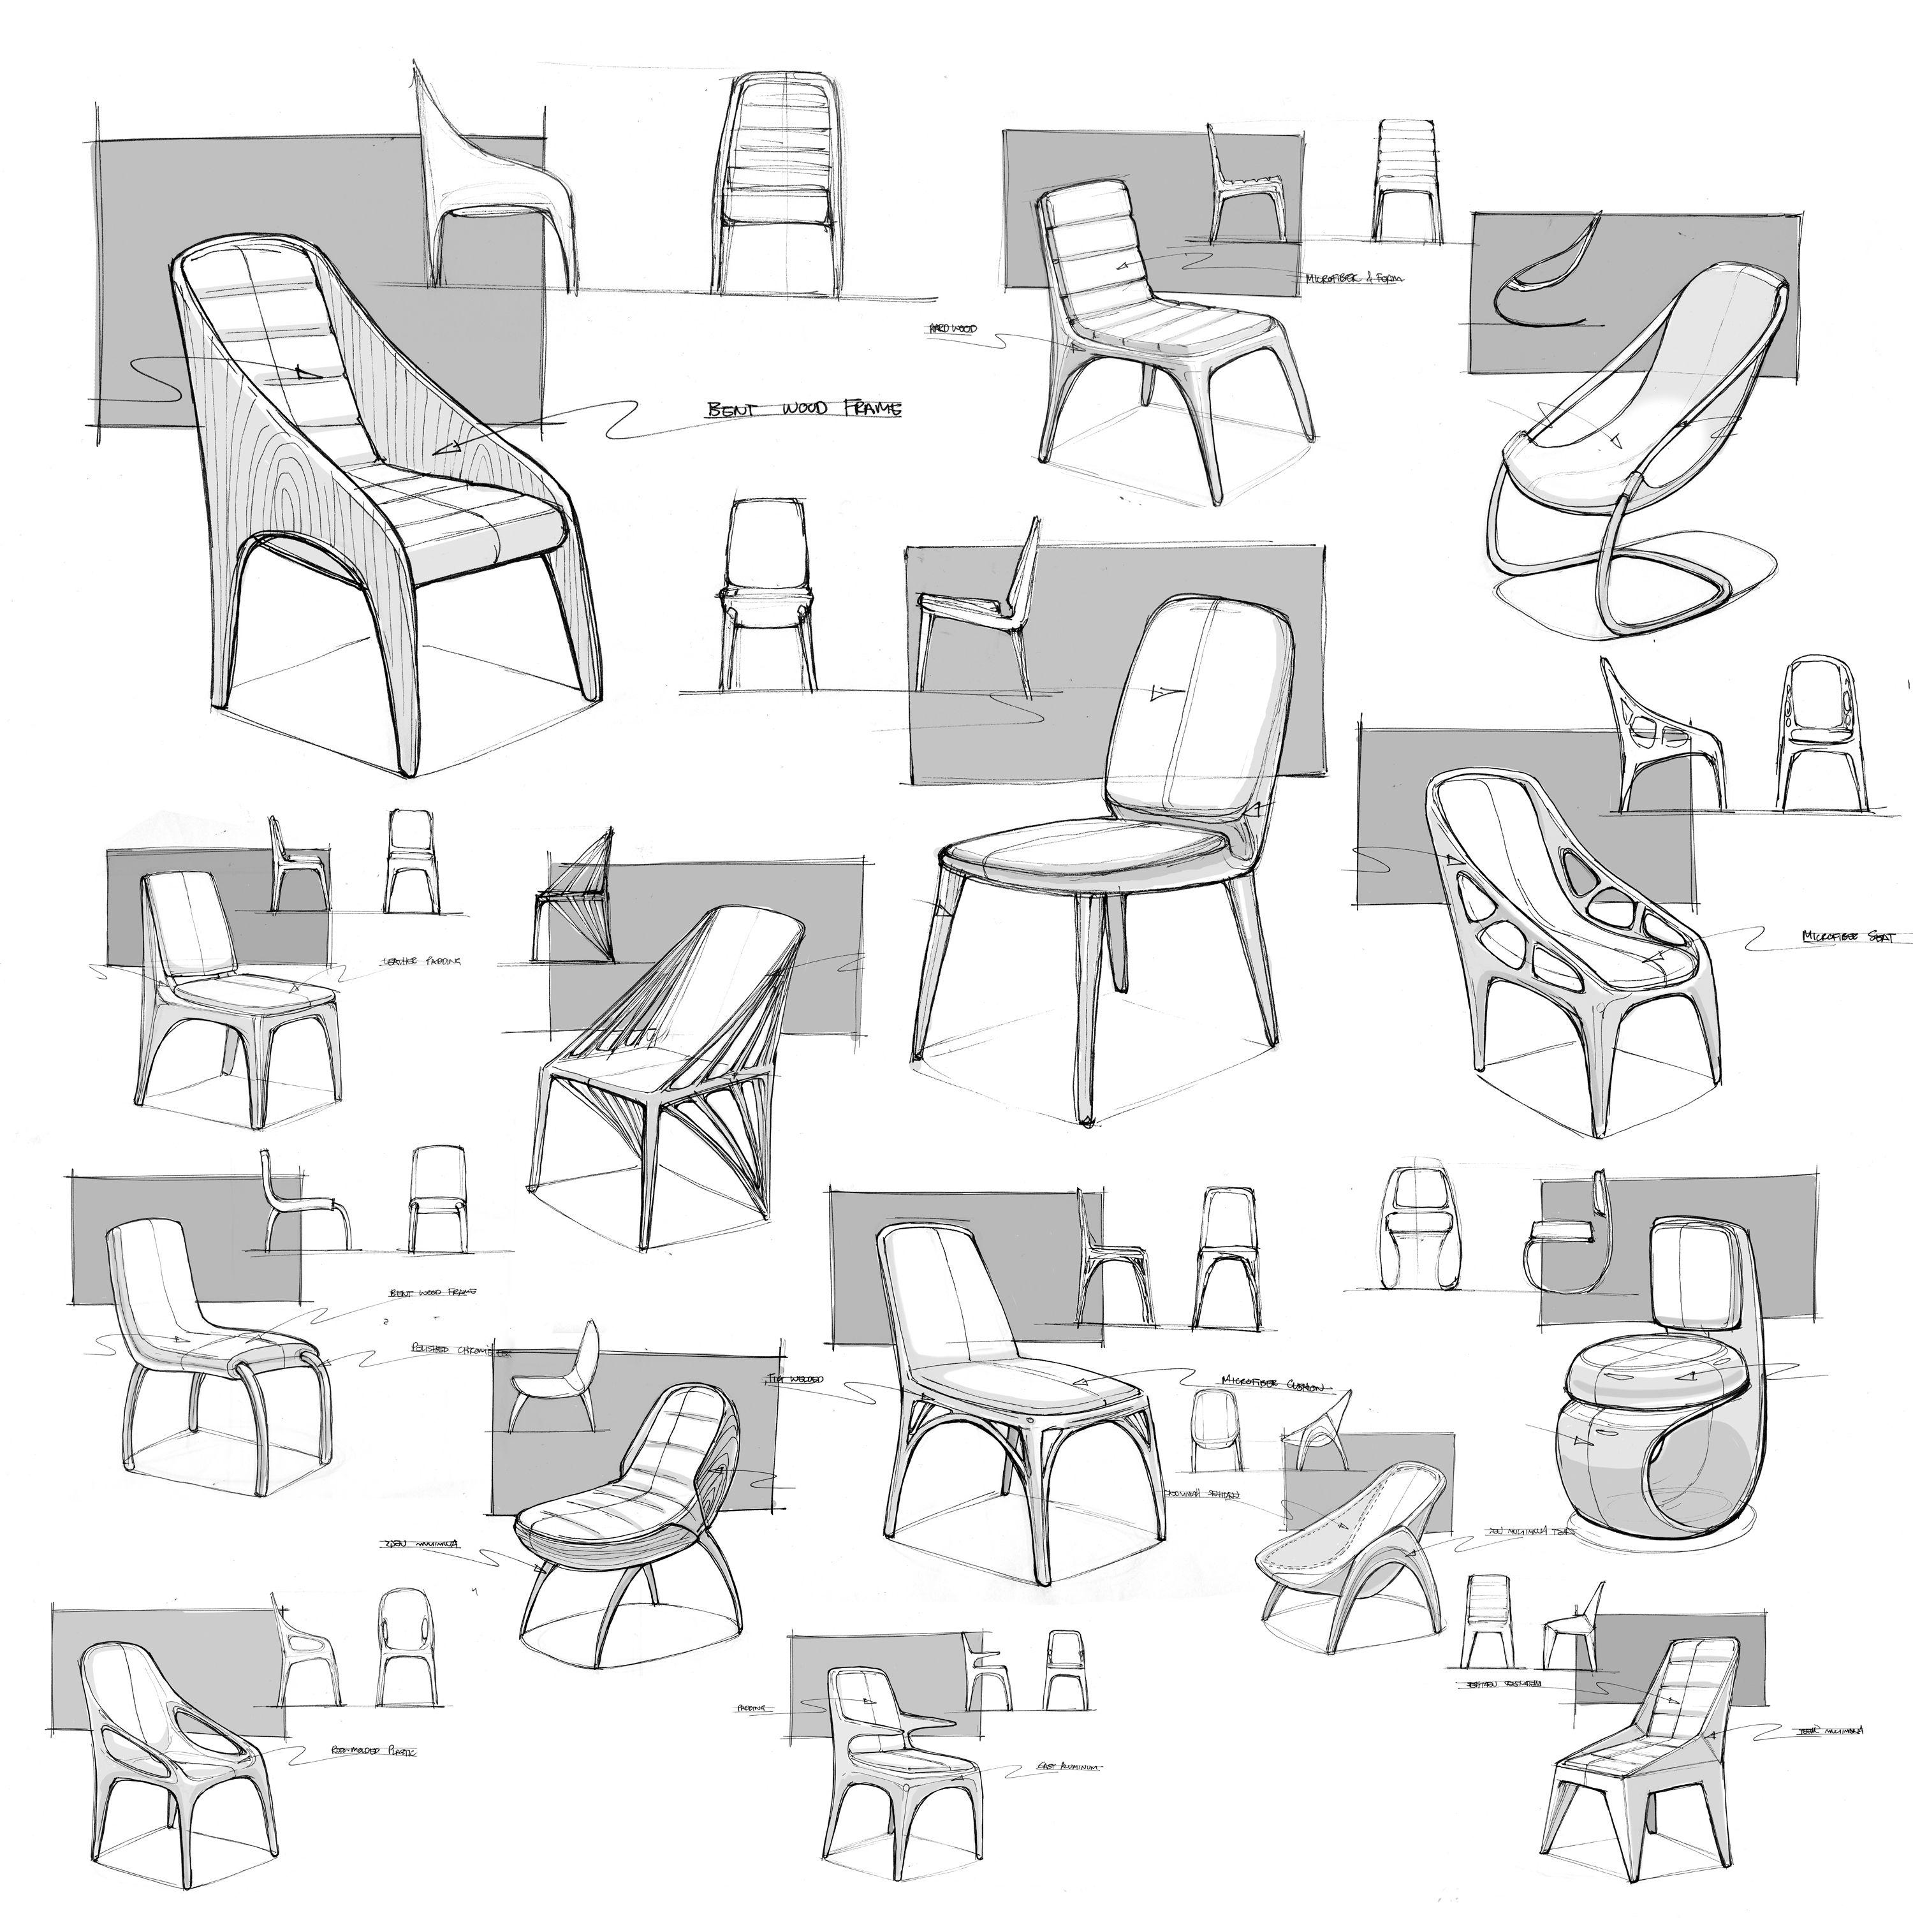 Design Sketch Chair Furniture Design Sketches Industrial Design Sketch Chair Design